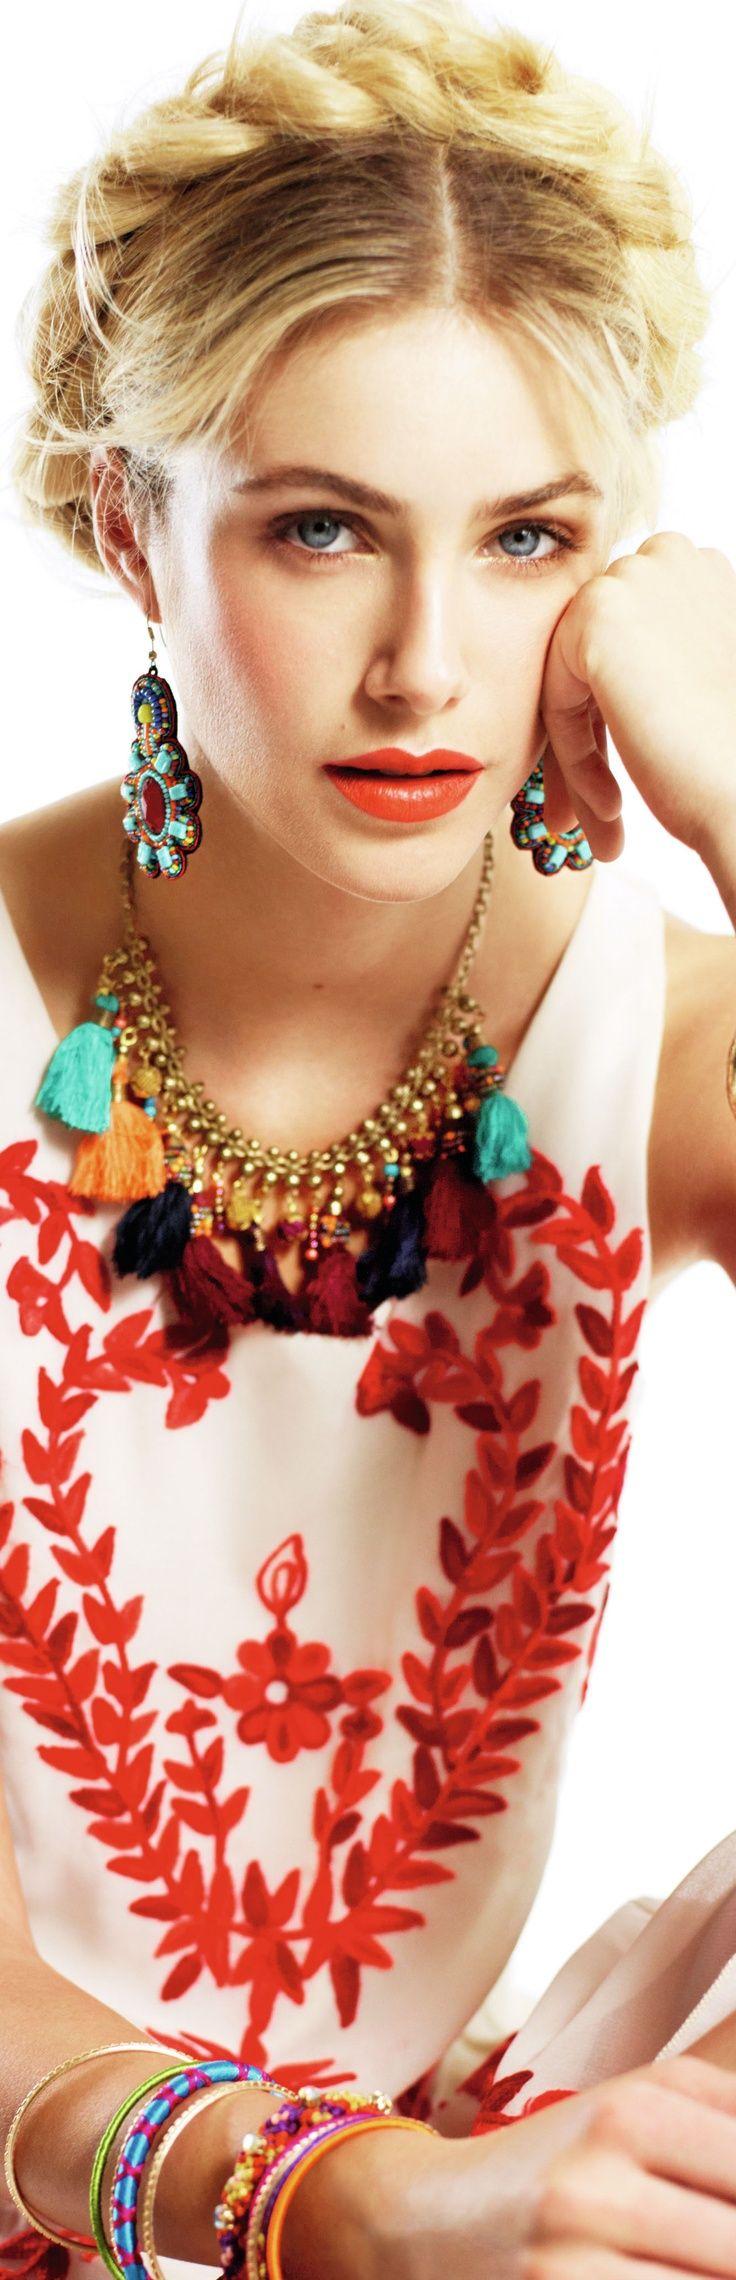 Glamour| Serafini Amelia| ROJO Y BLANCO....❤